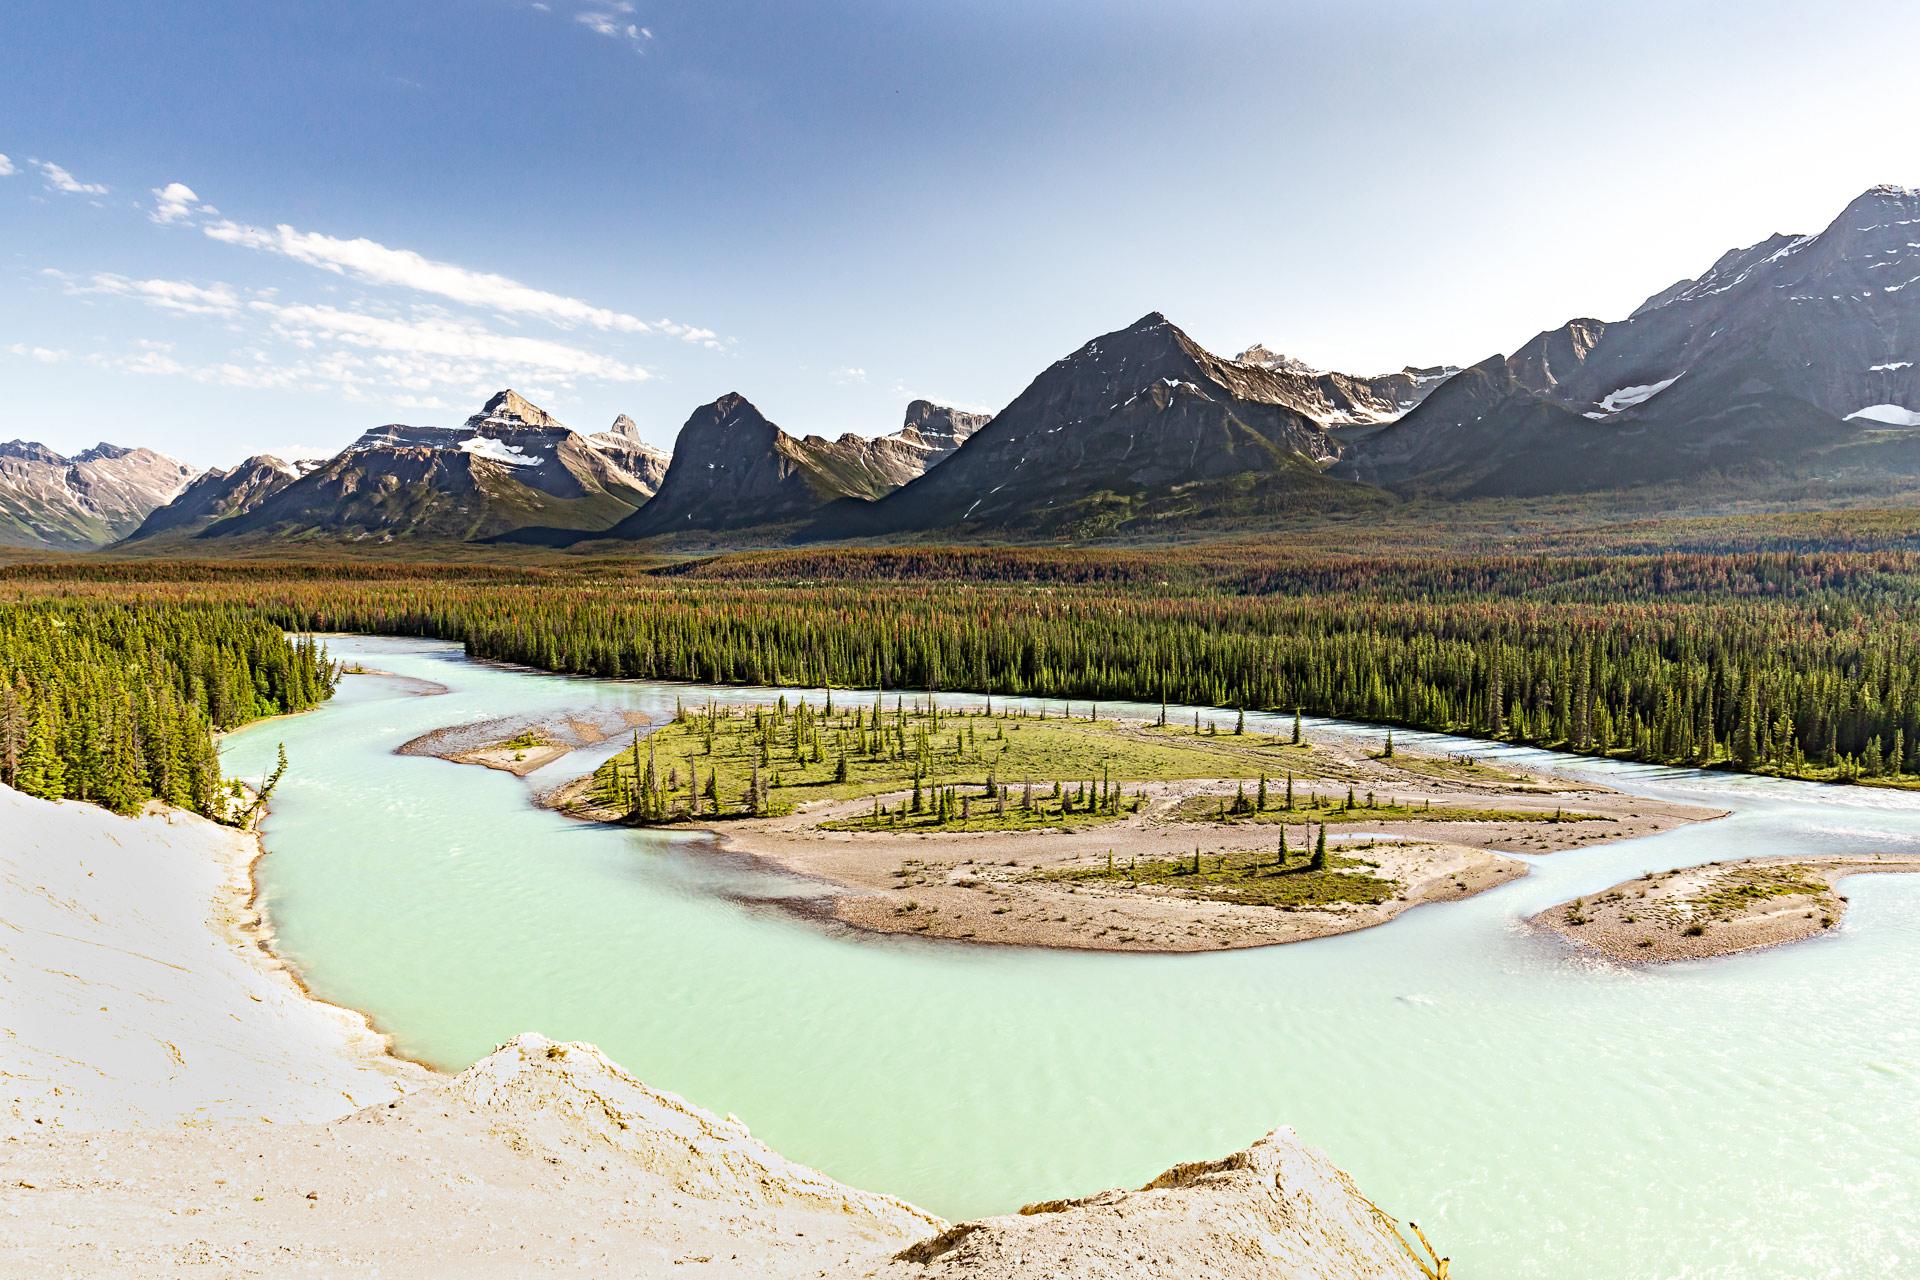 Rocheuses canadiennes promenade des glaciers